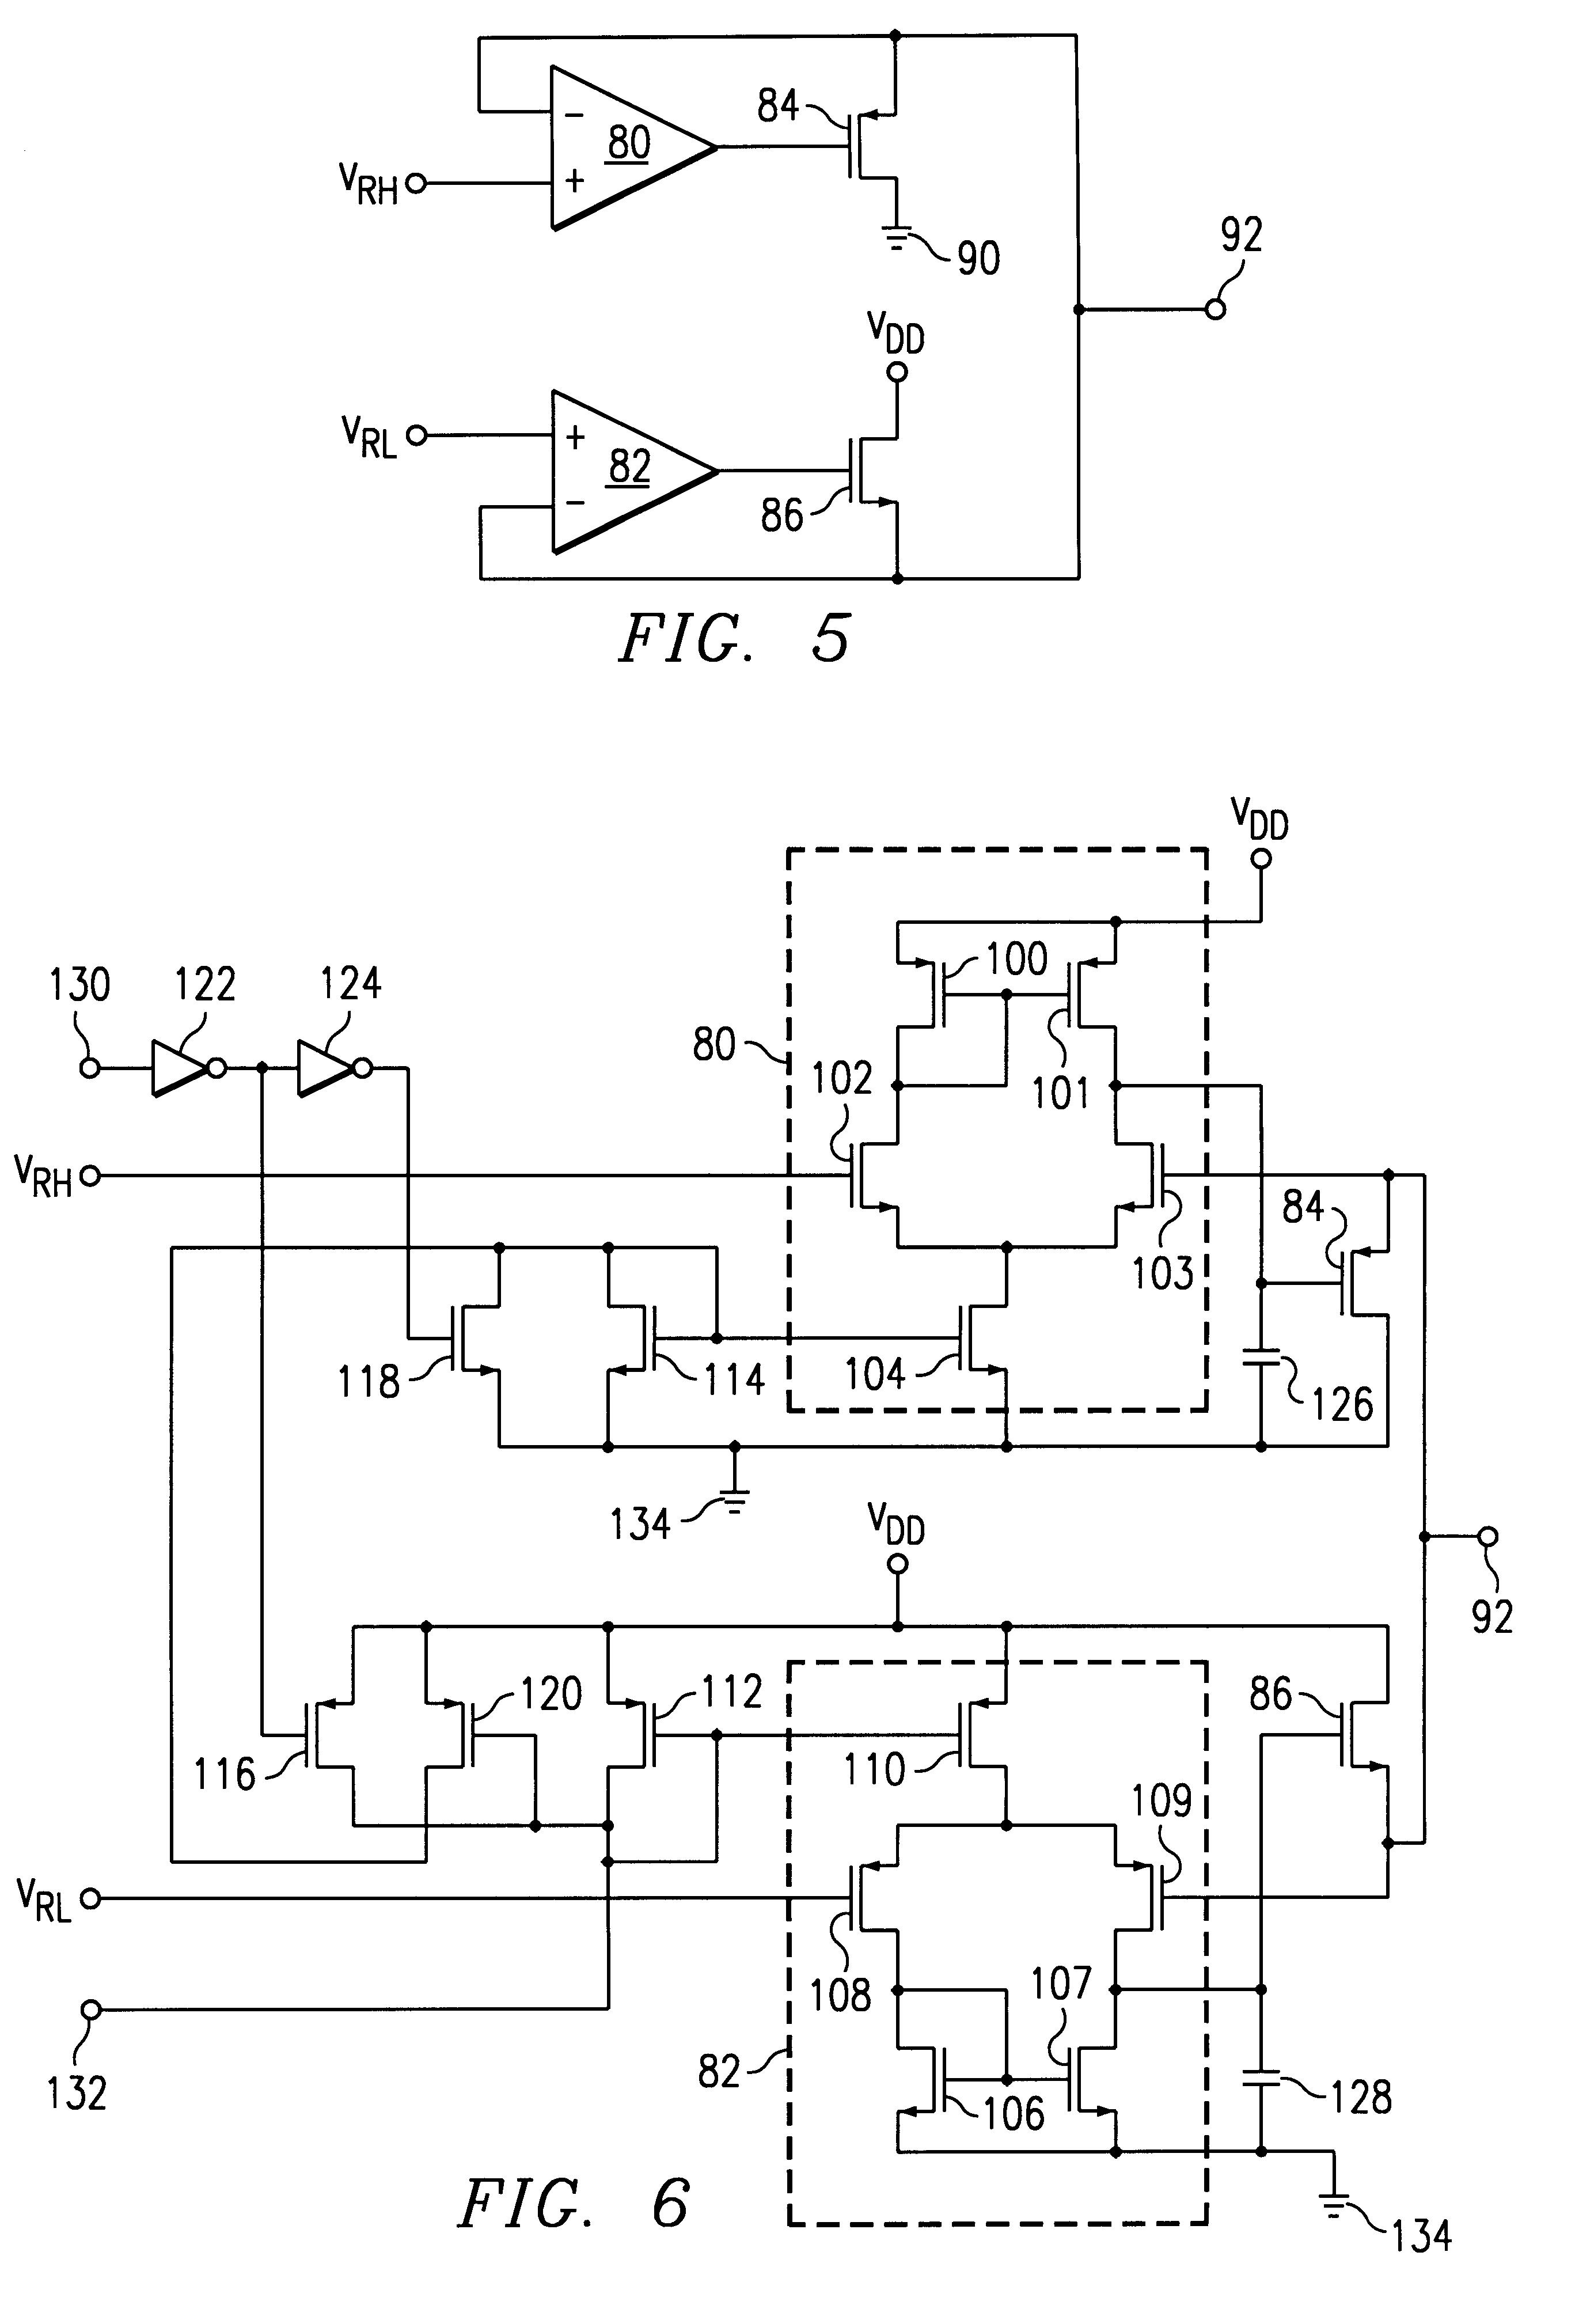 u0026gt  other circuits  u0026gt  model circuits  u0026gt  8 pad launch